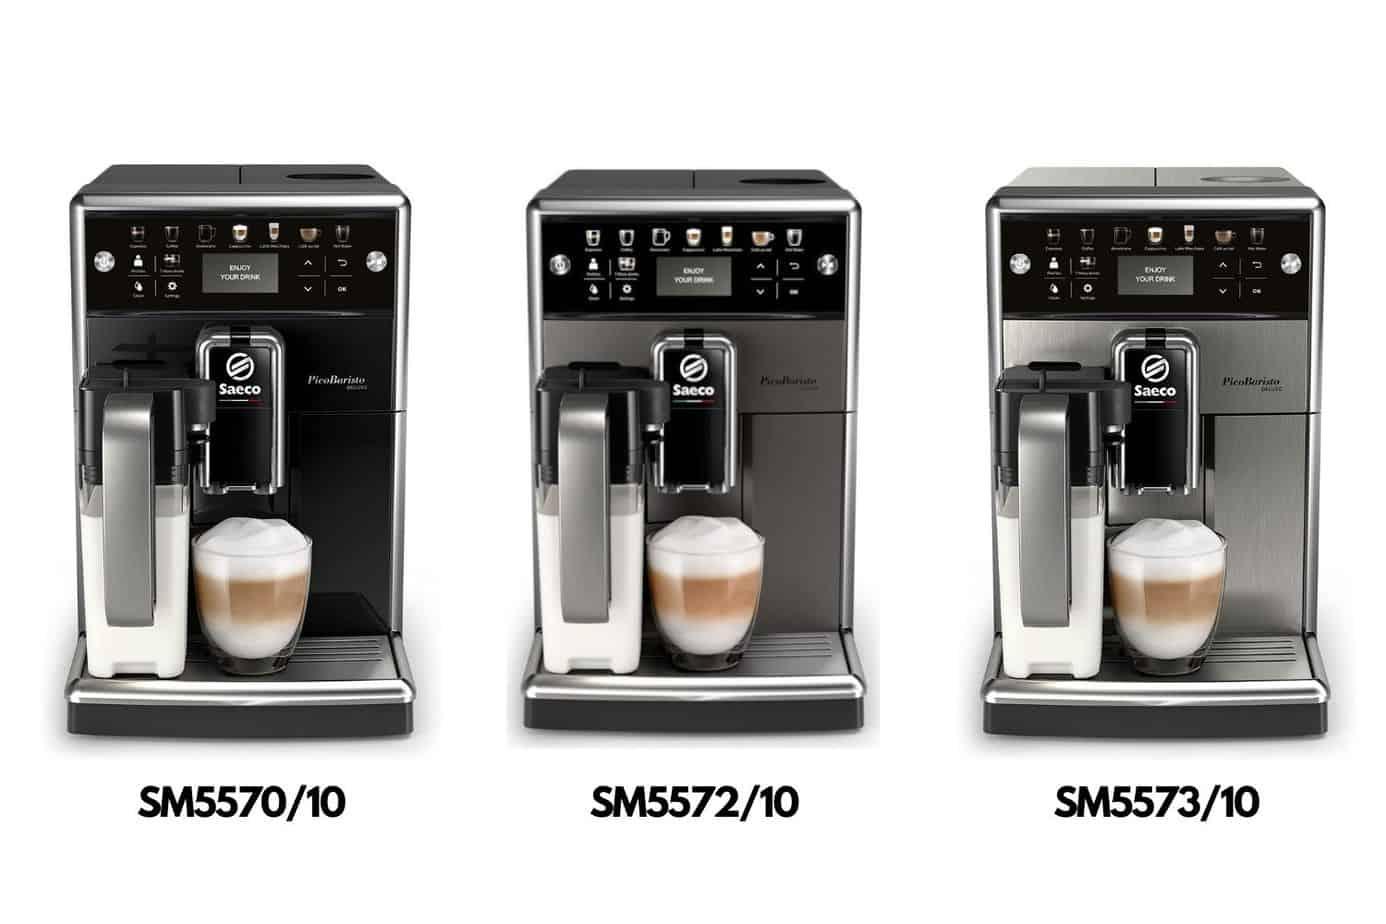 Saeco Picobaristo Kaffeevollautomat Vergleich